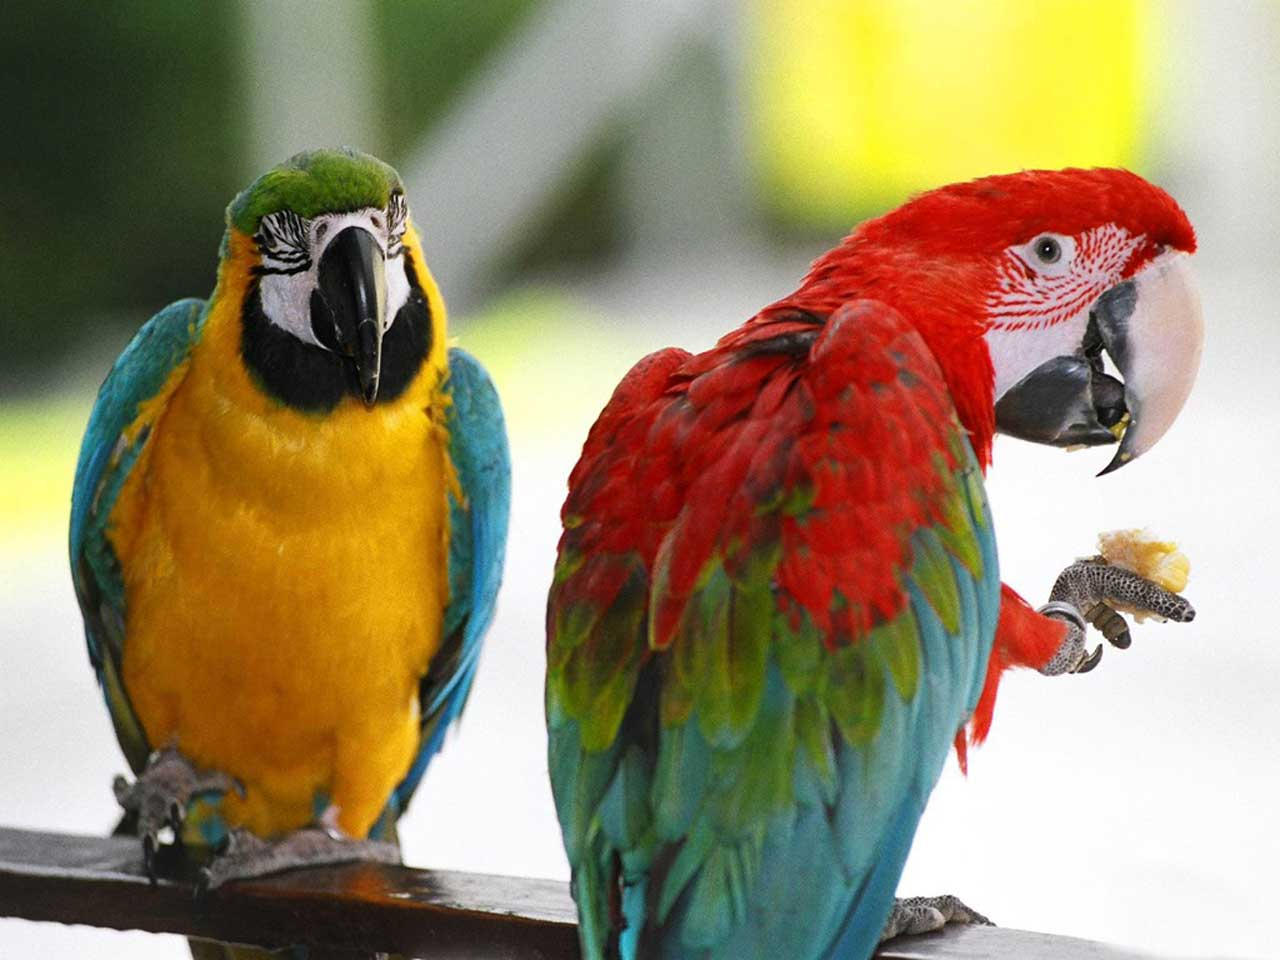 pictures of parrots